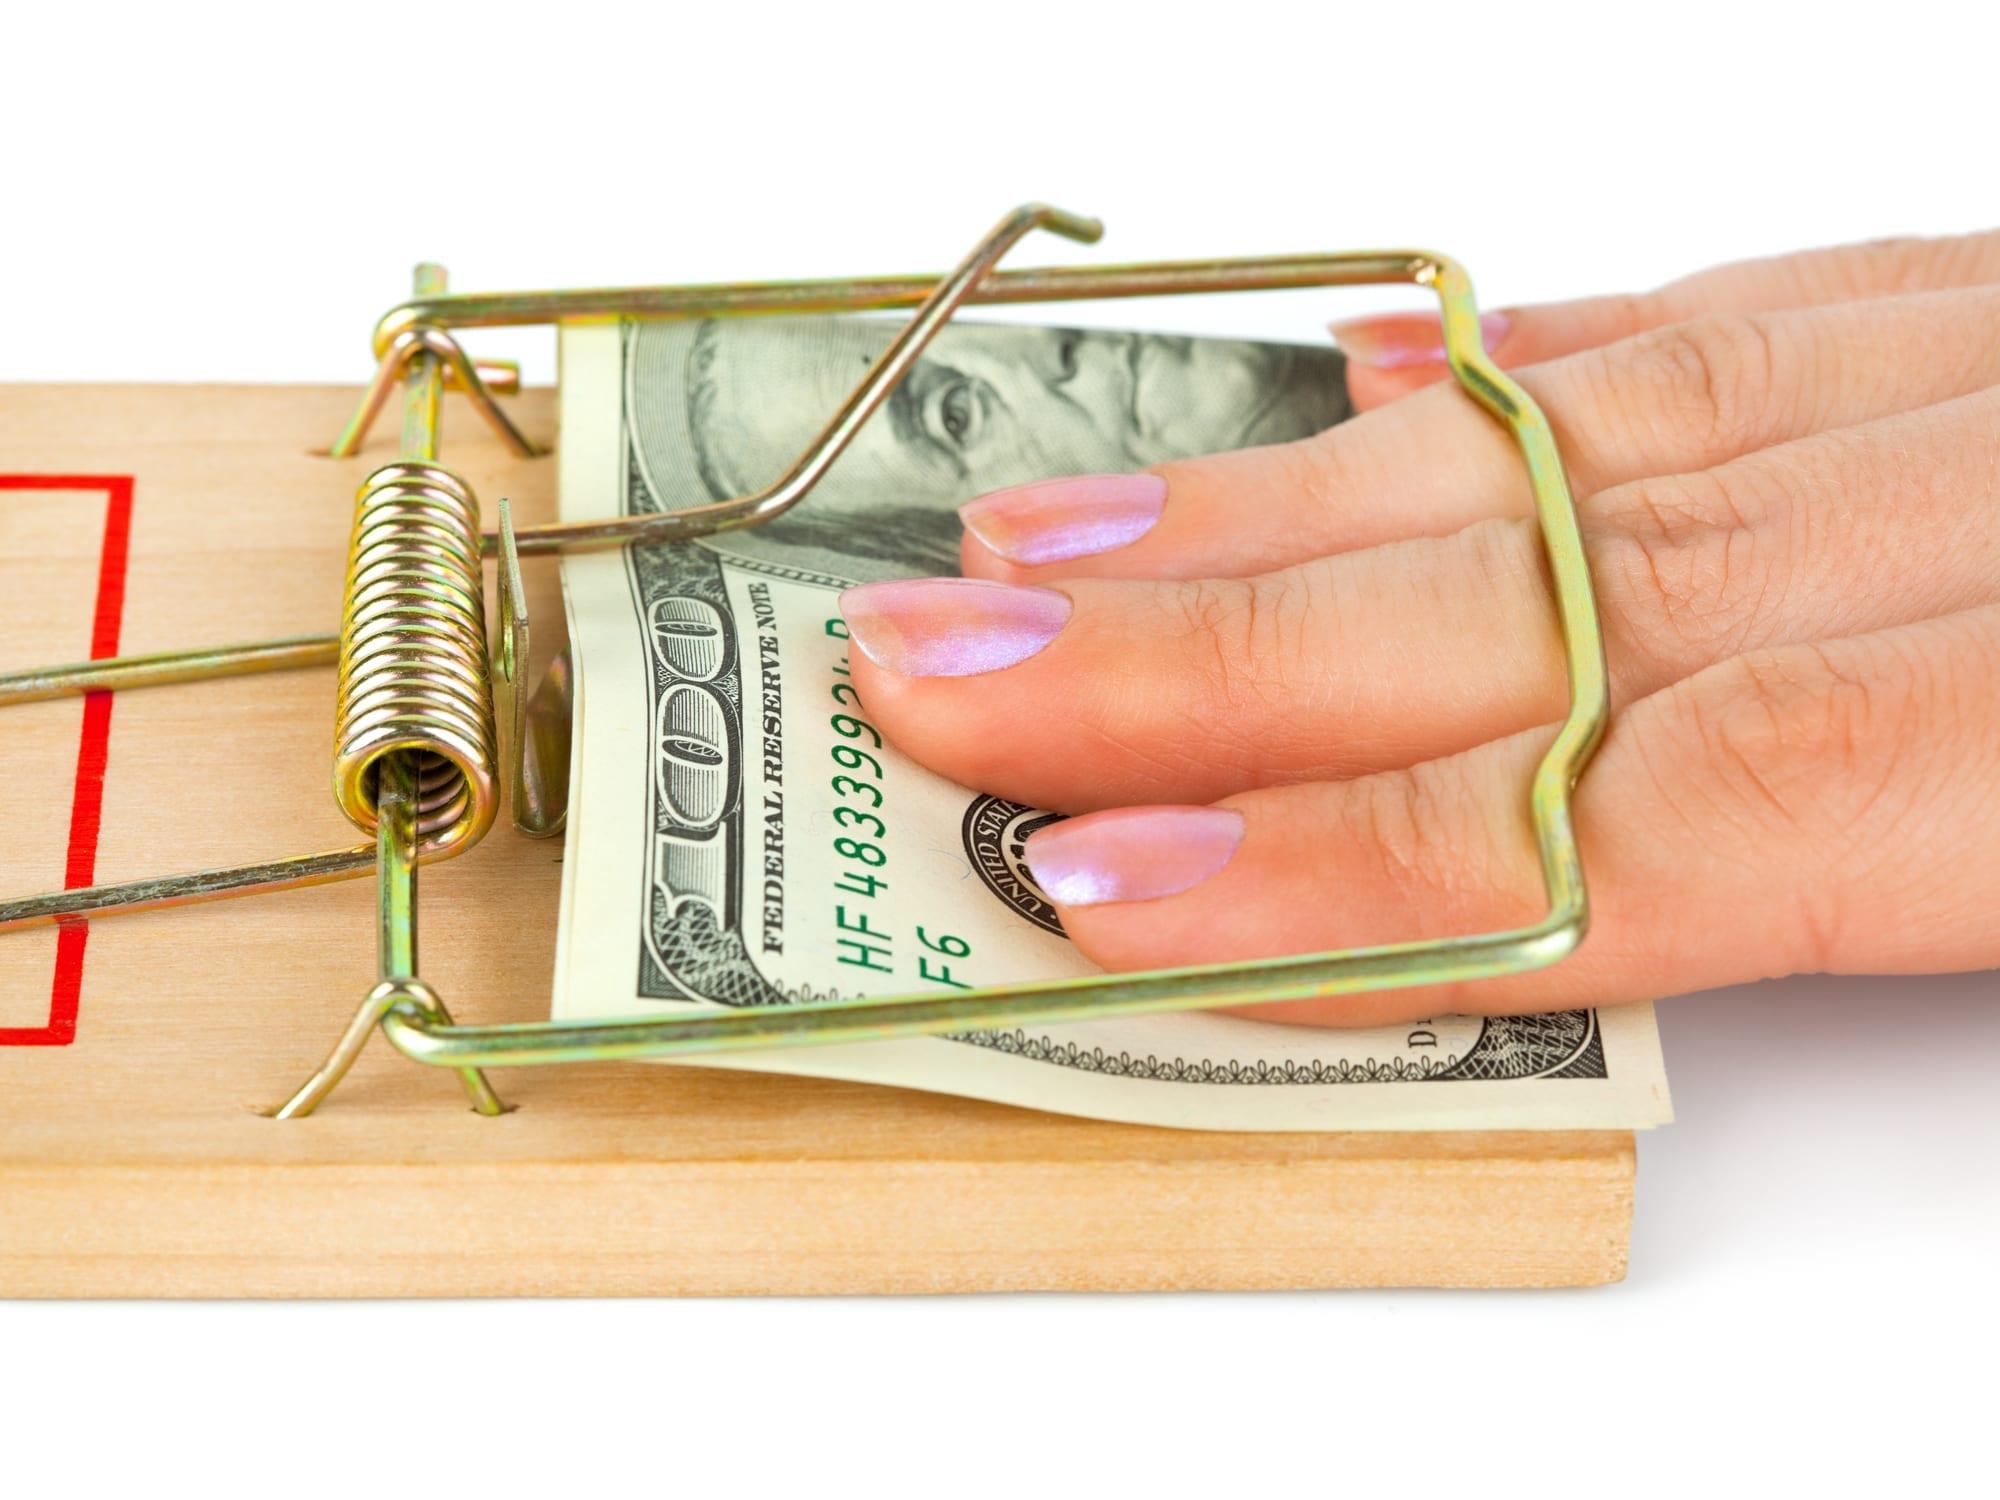 Pennsylvania trustee attorney's fees